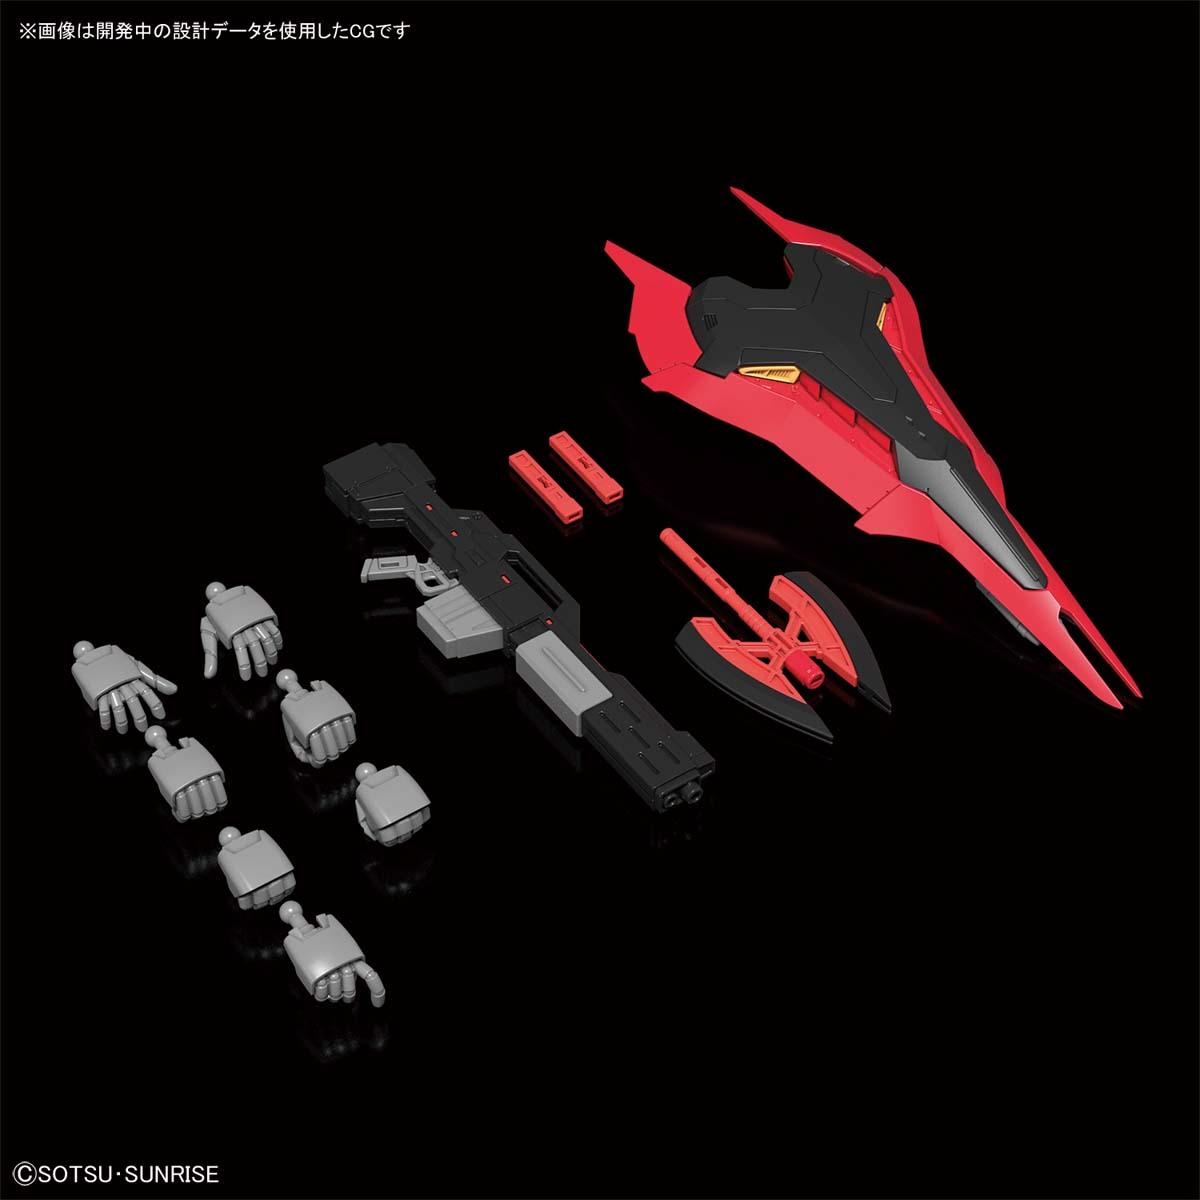 RG #29 1/144 MSN-04 Sazabi - Release Info - Gundam Kits Collection on